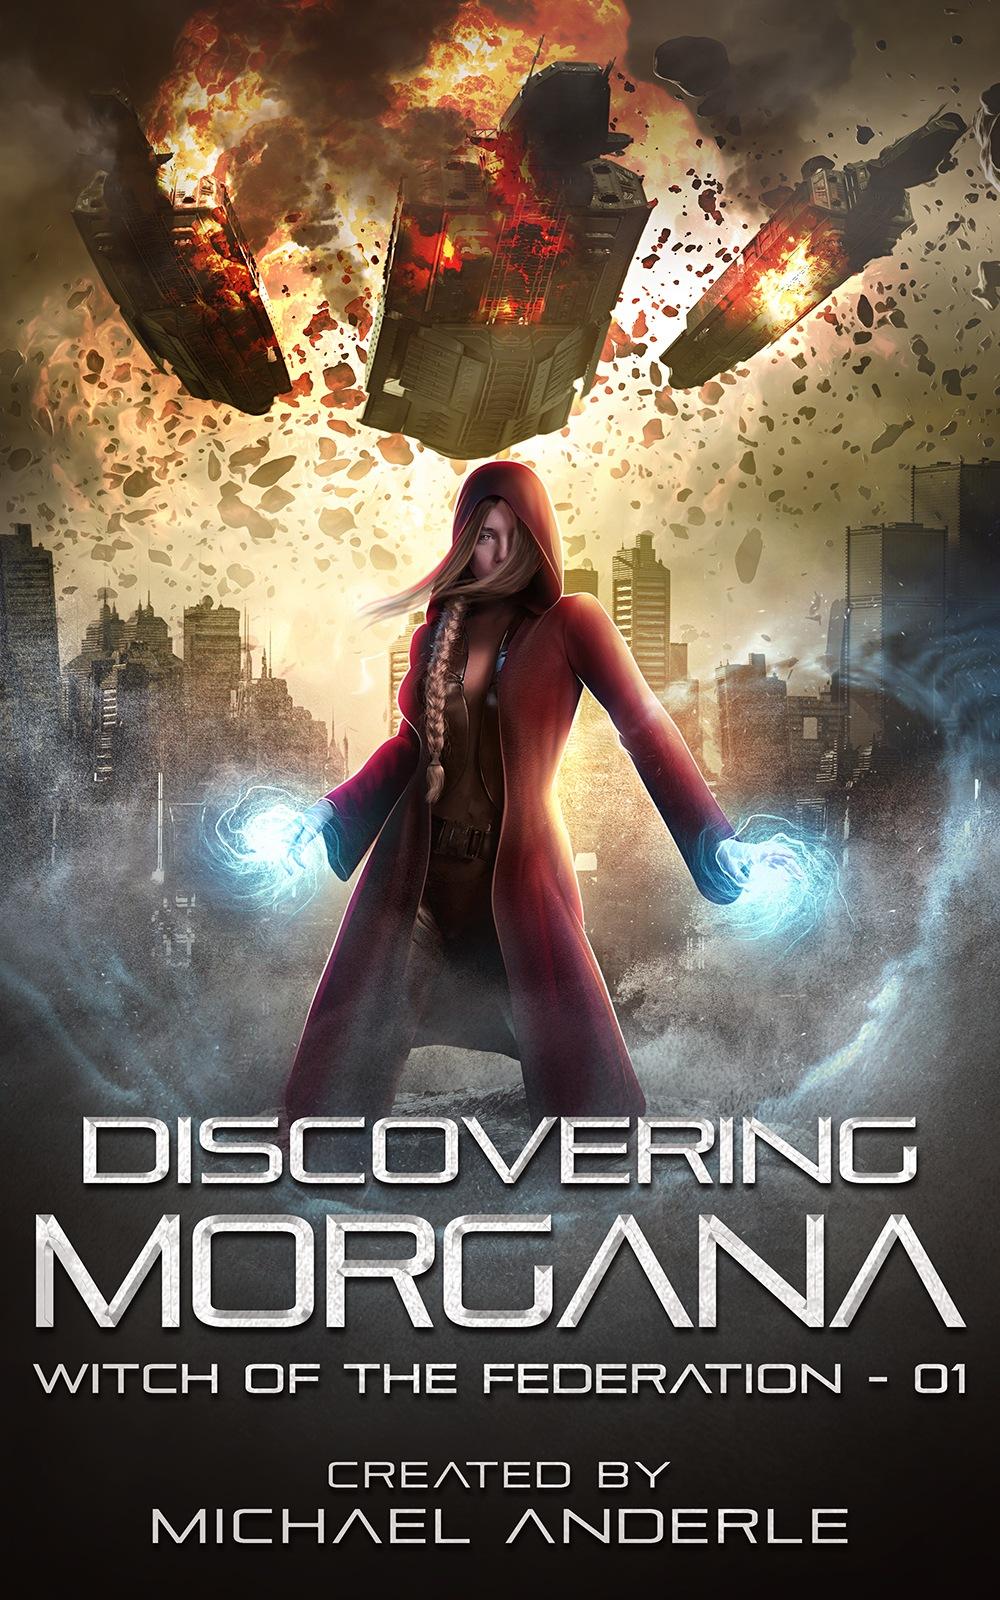 DISOCERING MORGANA E-BOOK COVER